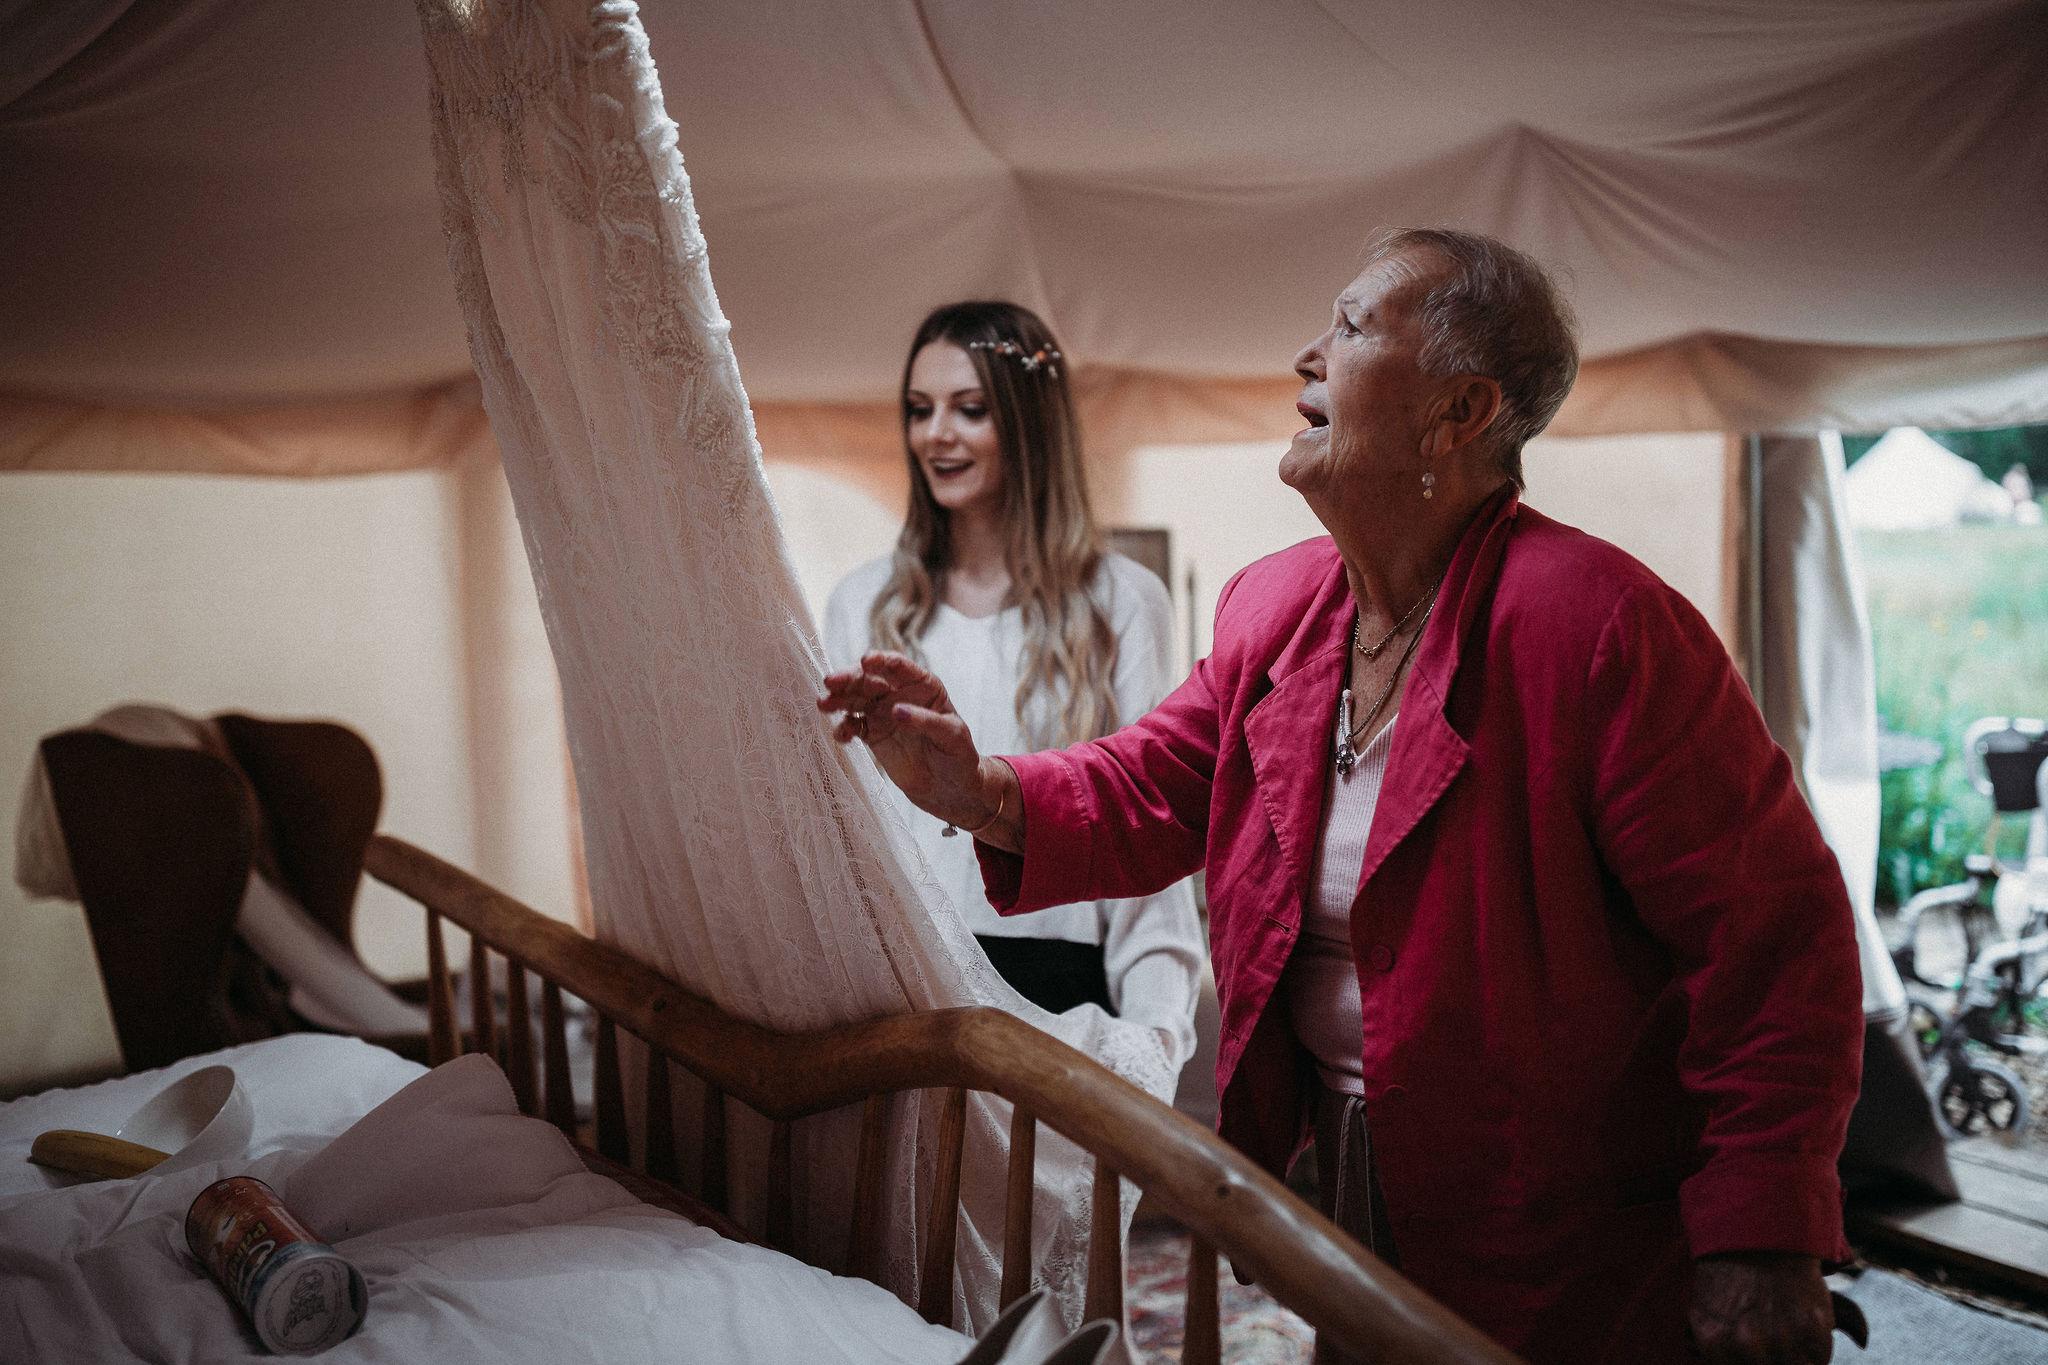 Admiring the wedding dress